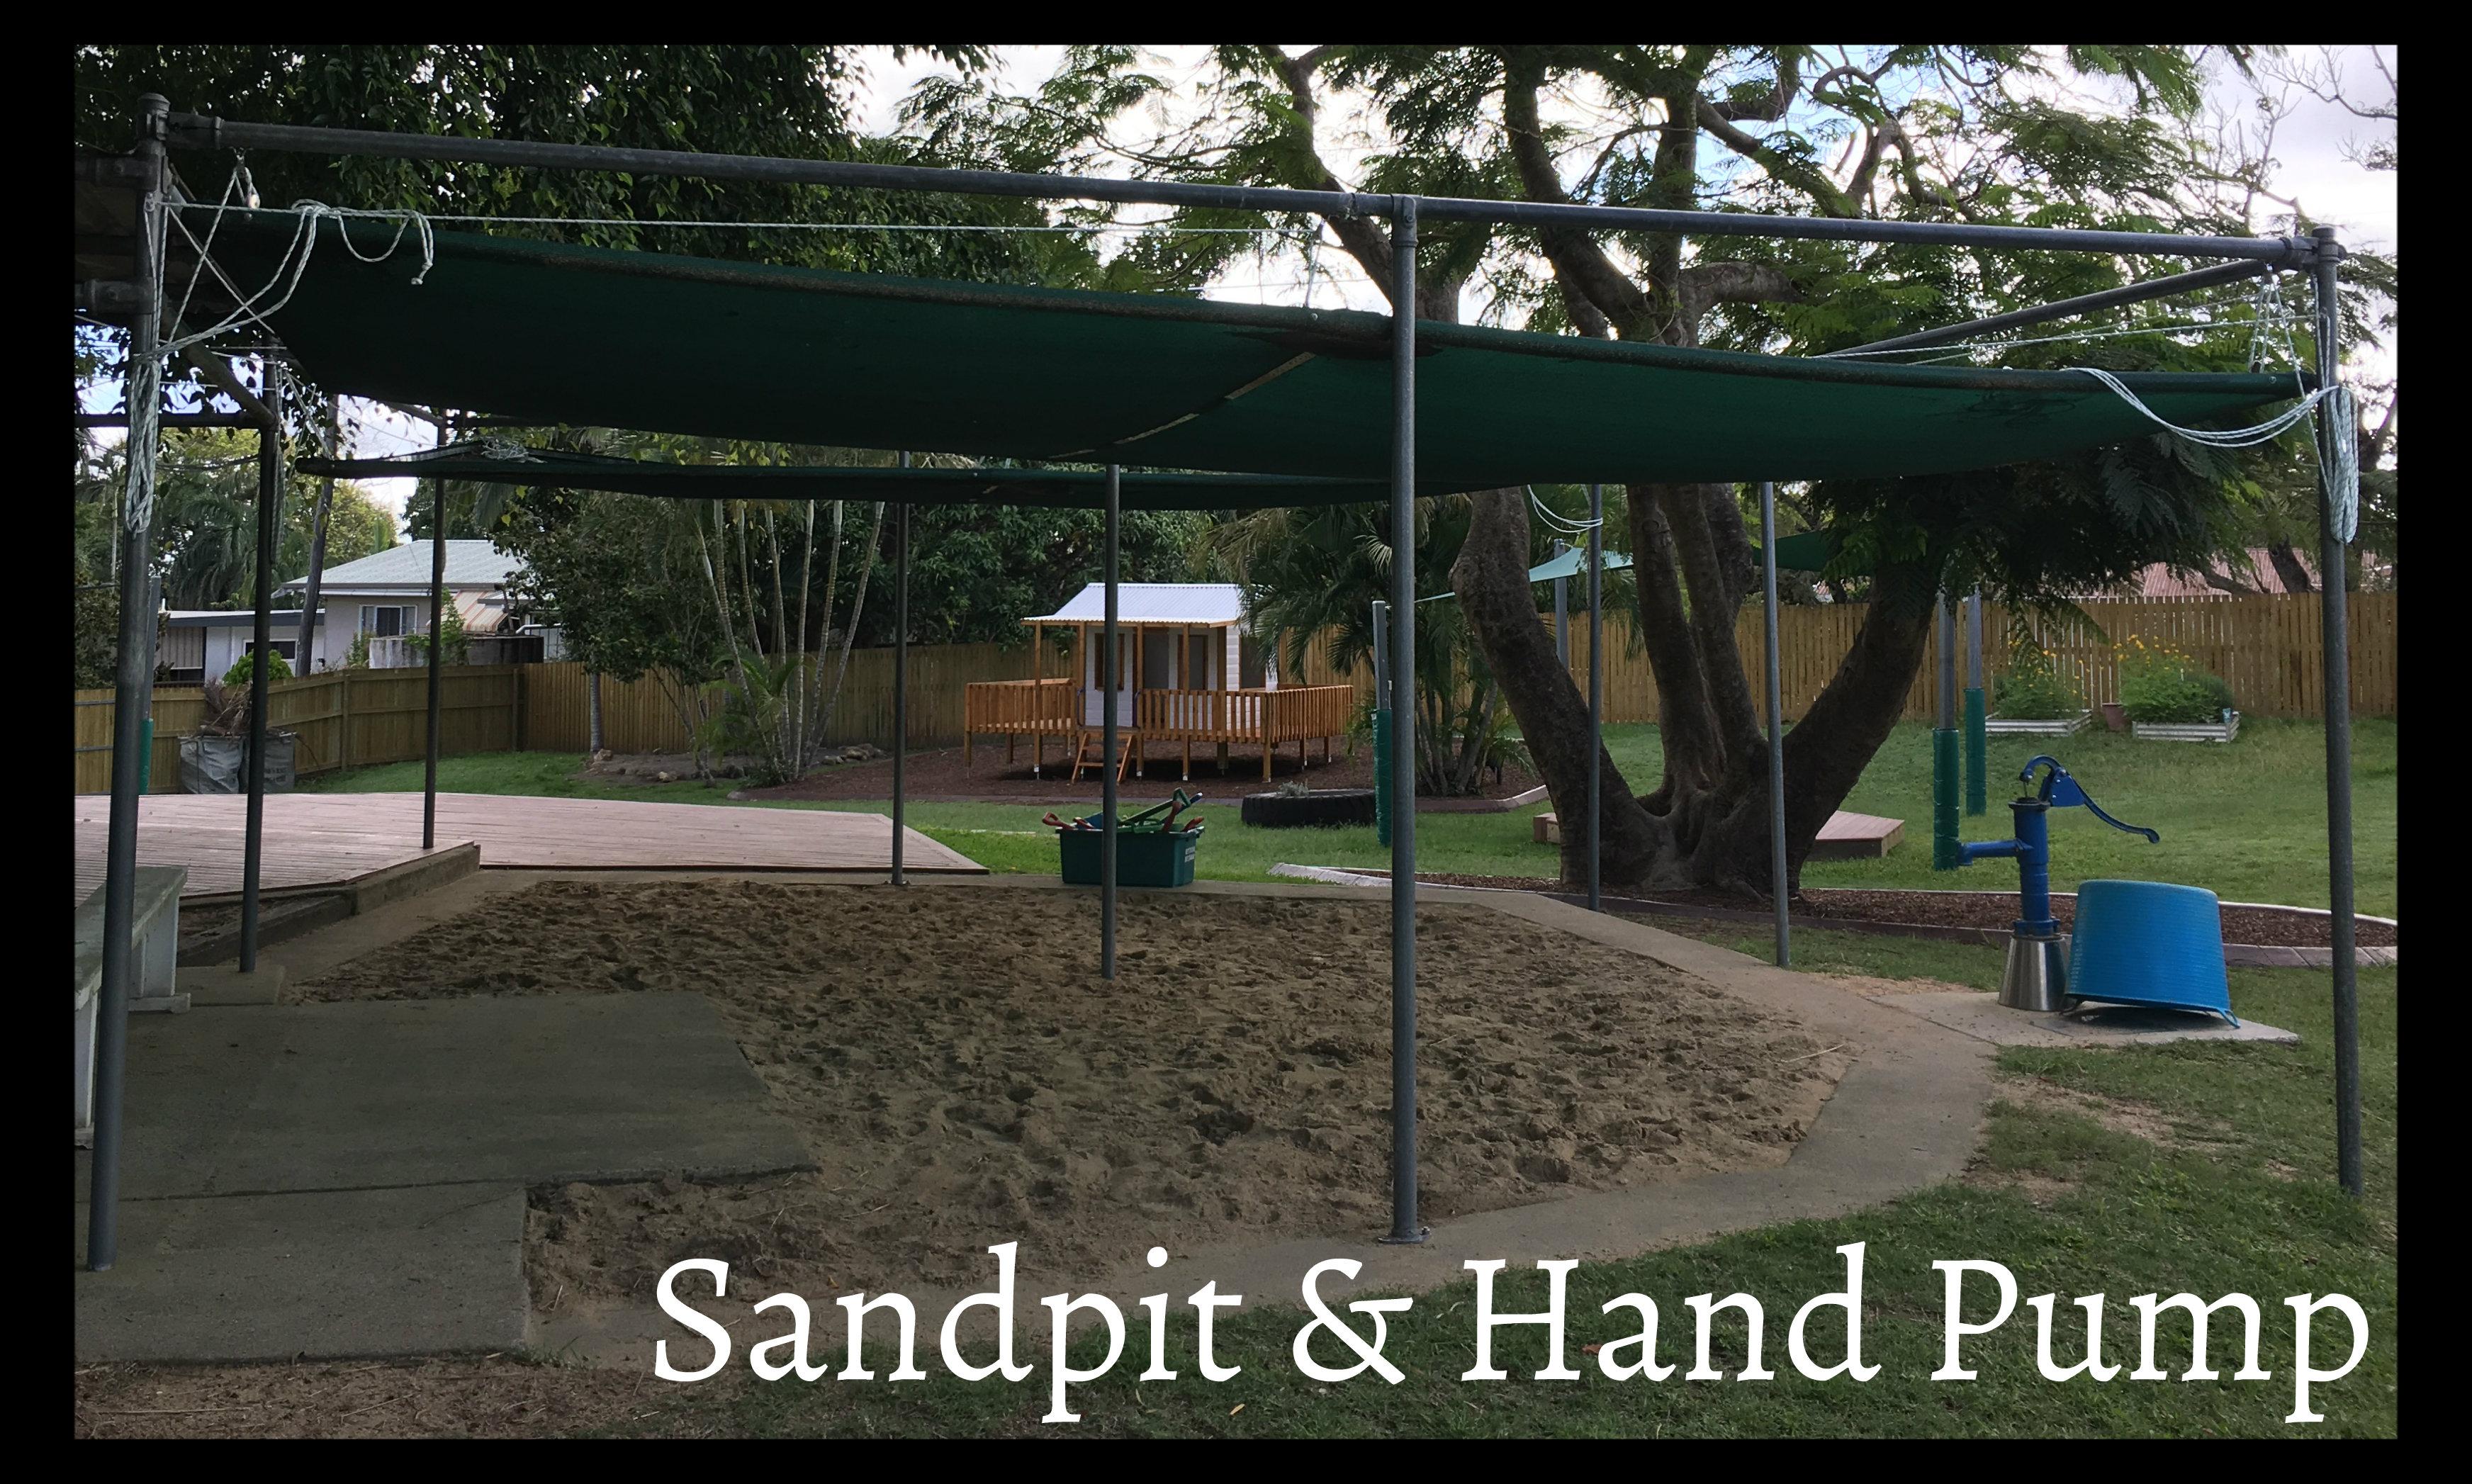 Sandpit & Hand Pump